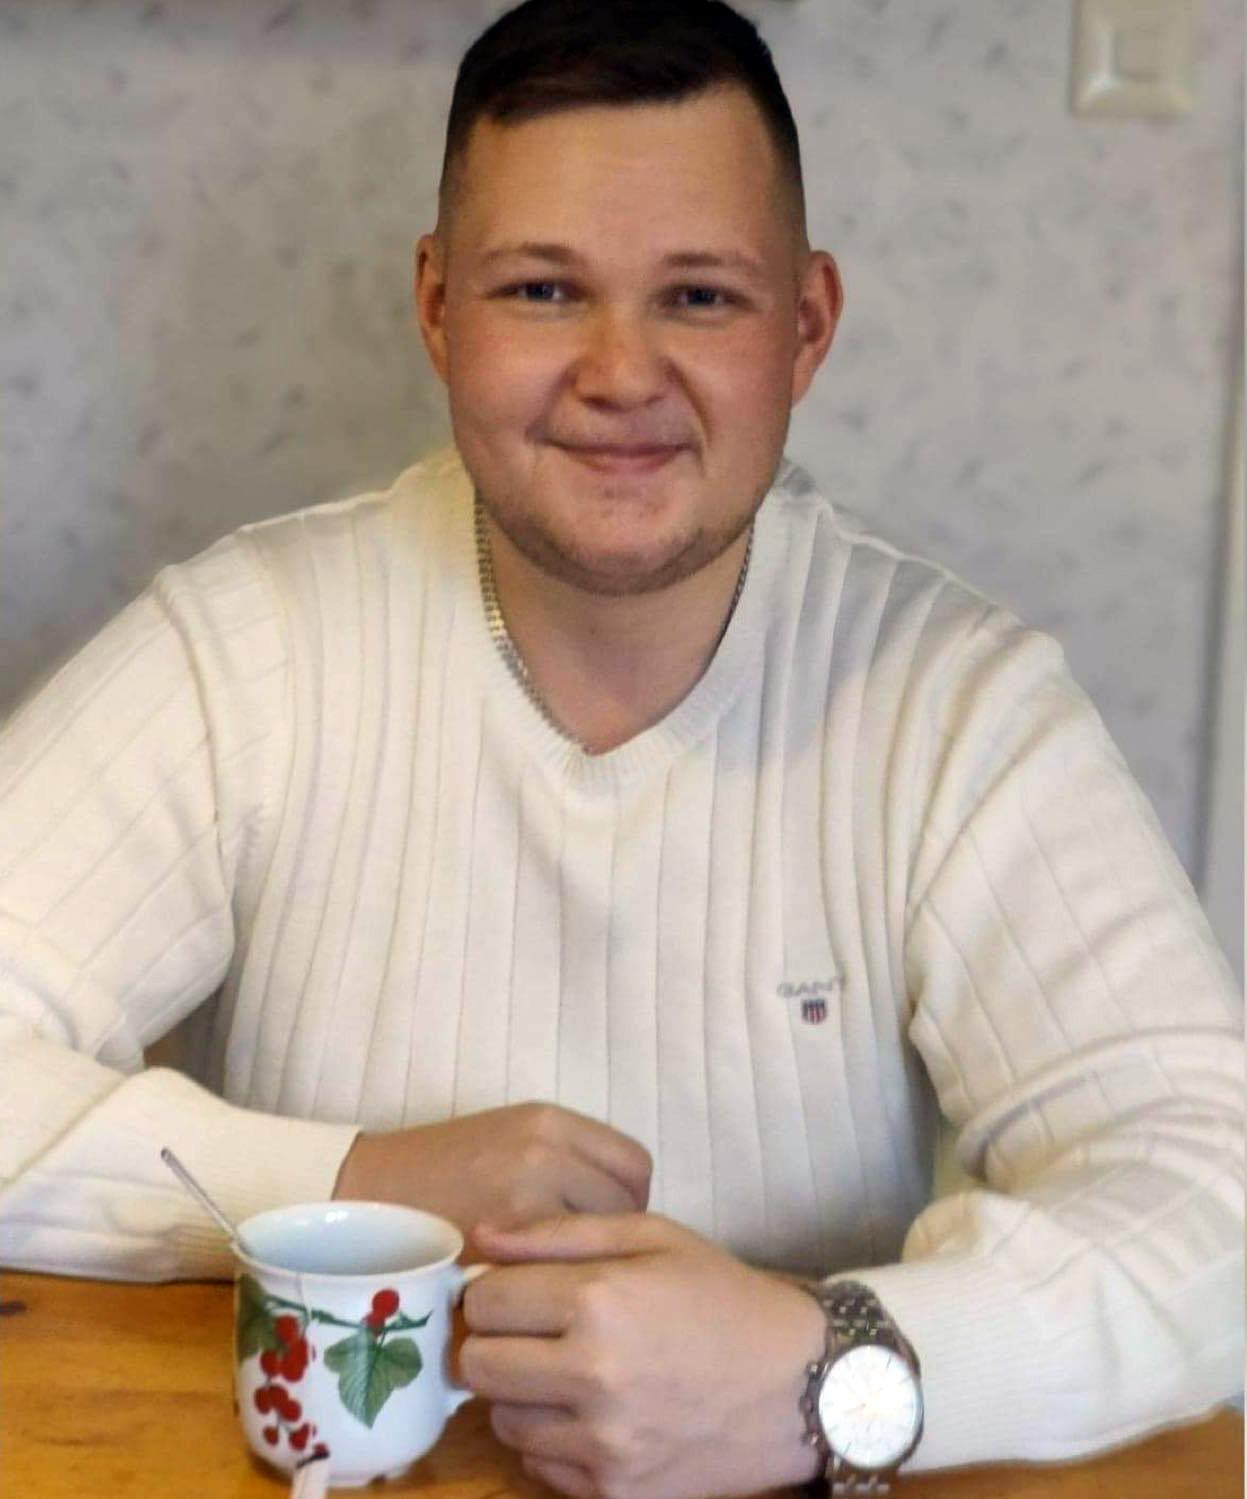 Niklas Asplund